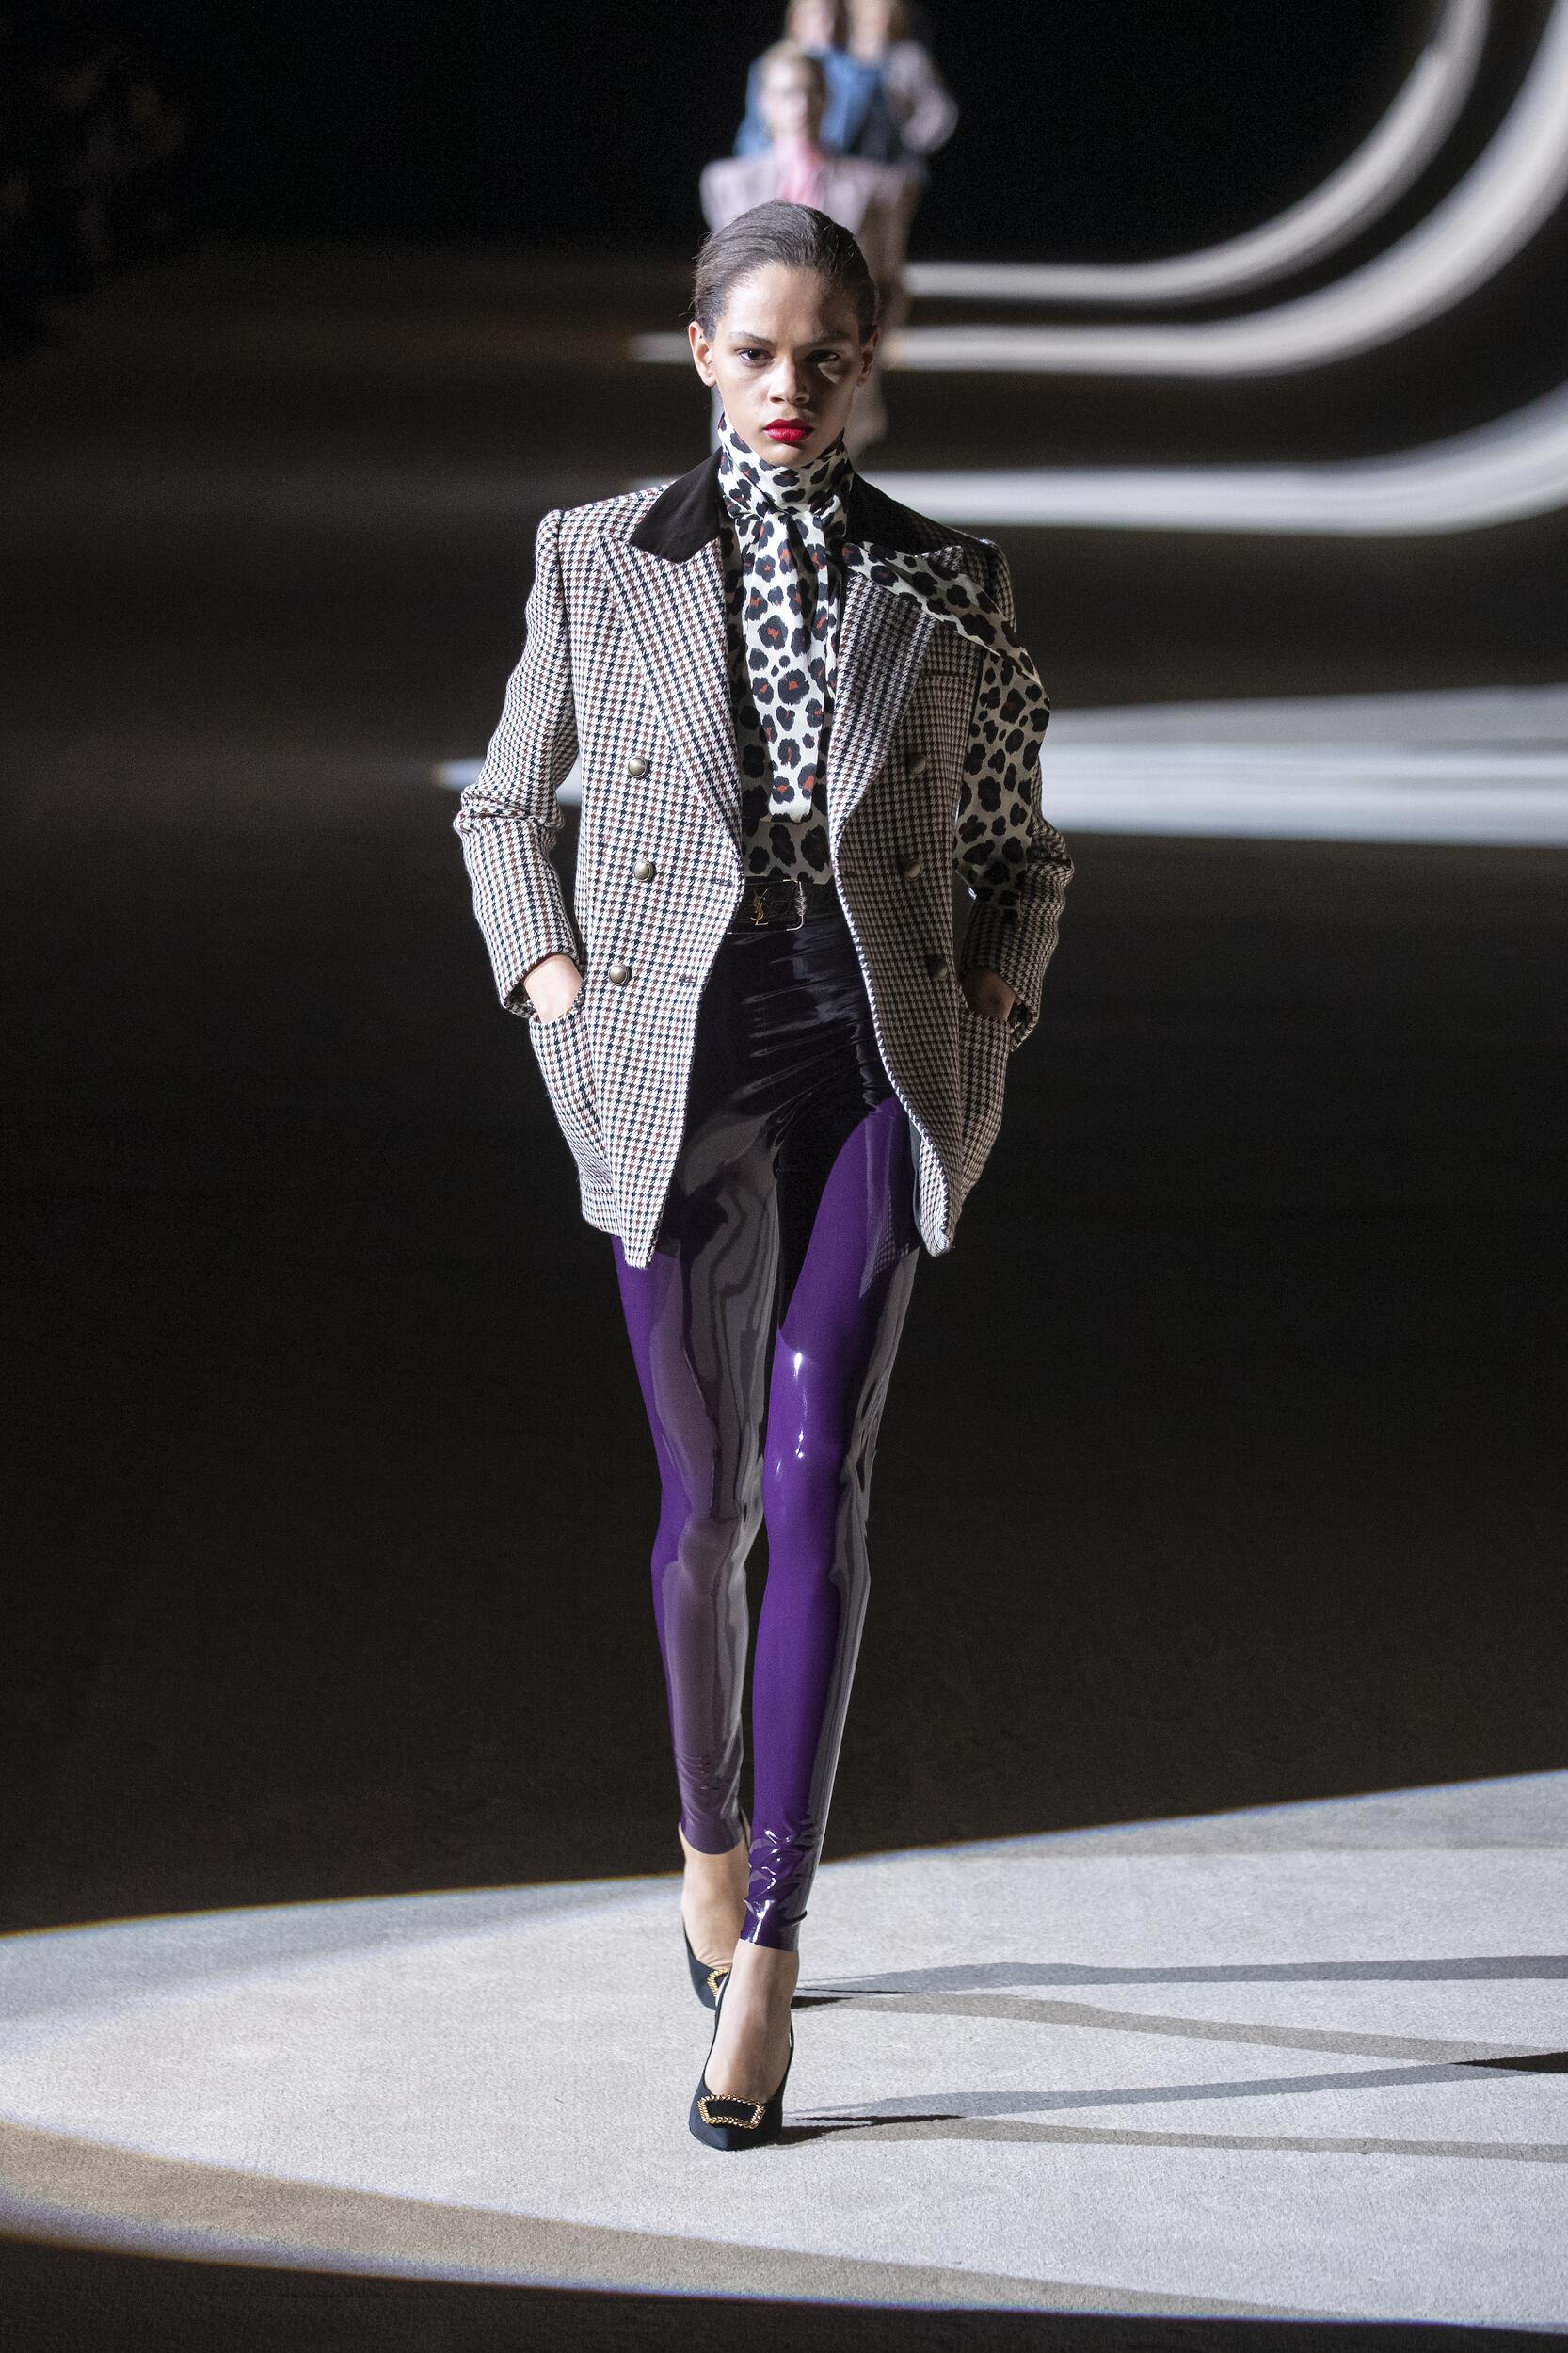 Runway Saint Laurent Fall Winter 2020 Women's Collection Paris Fashion Week